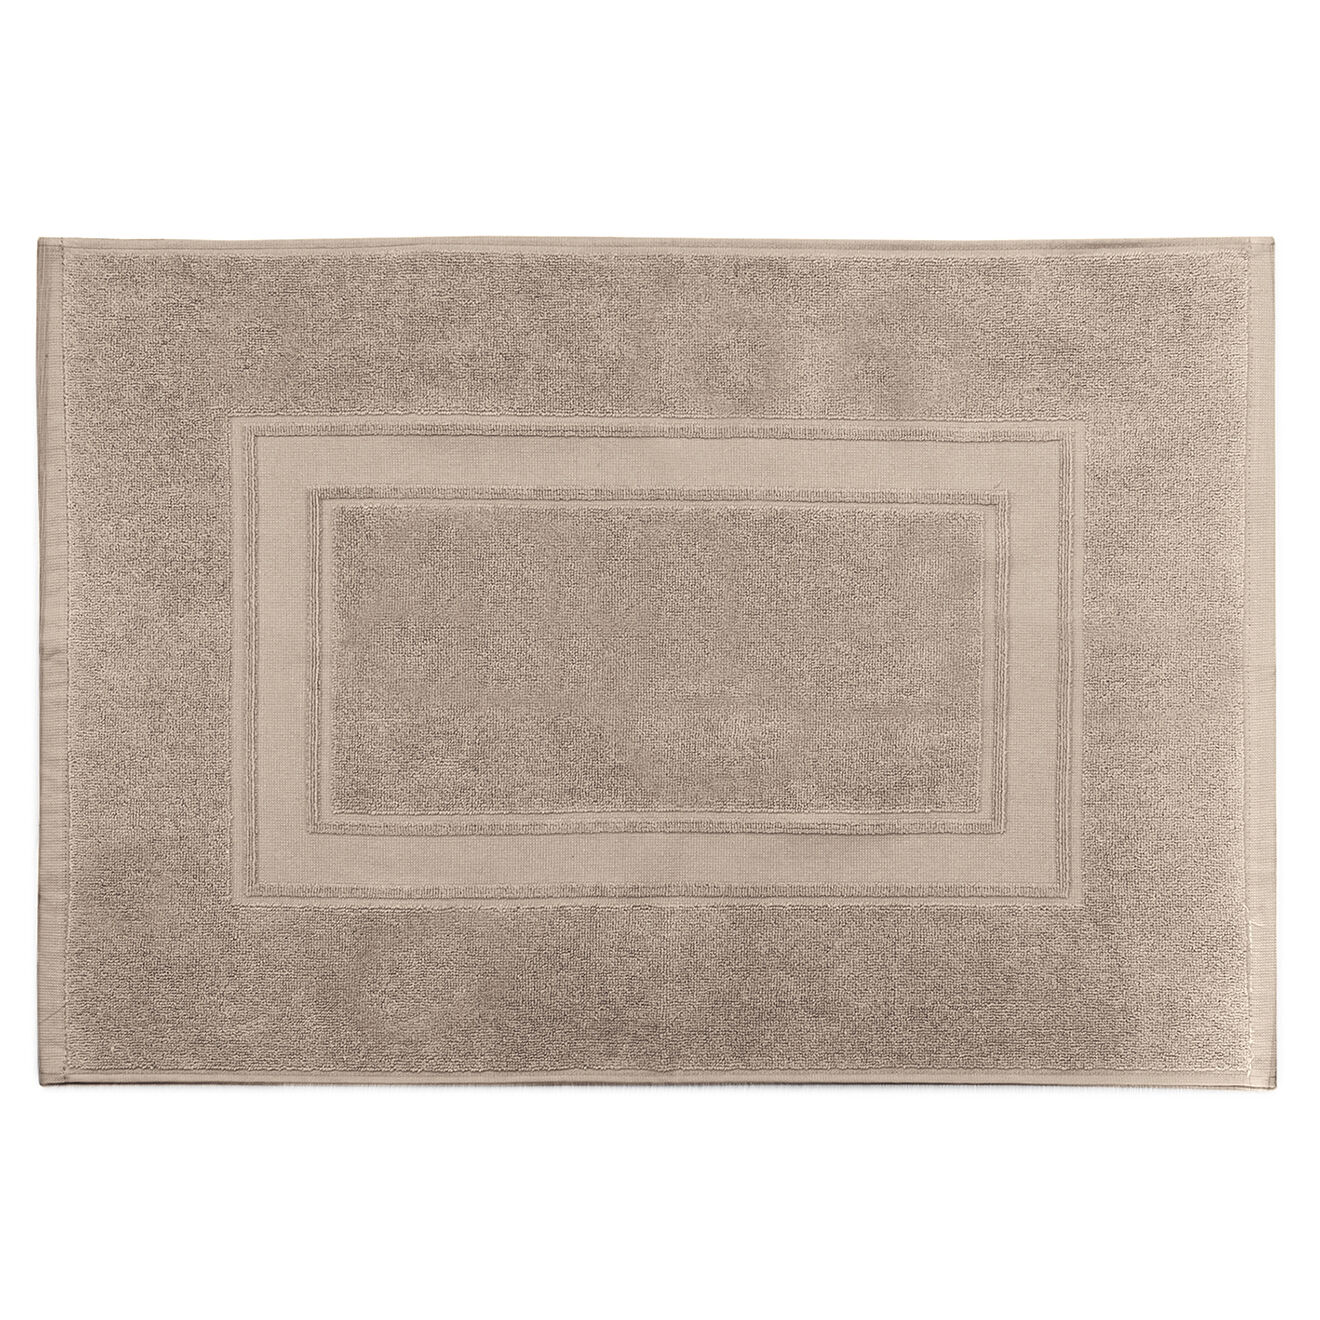 Tapis de bain Elisa taupe - 50x70 cm